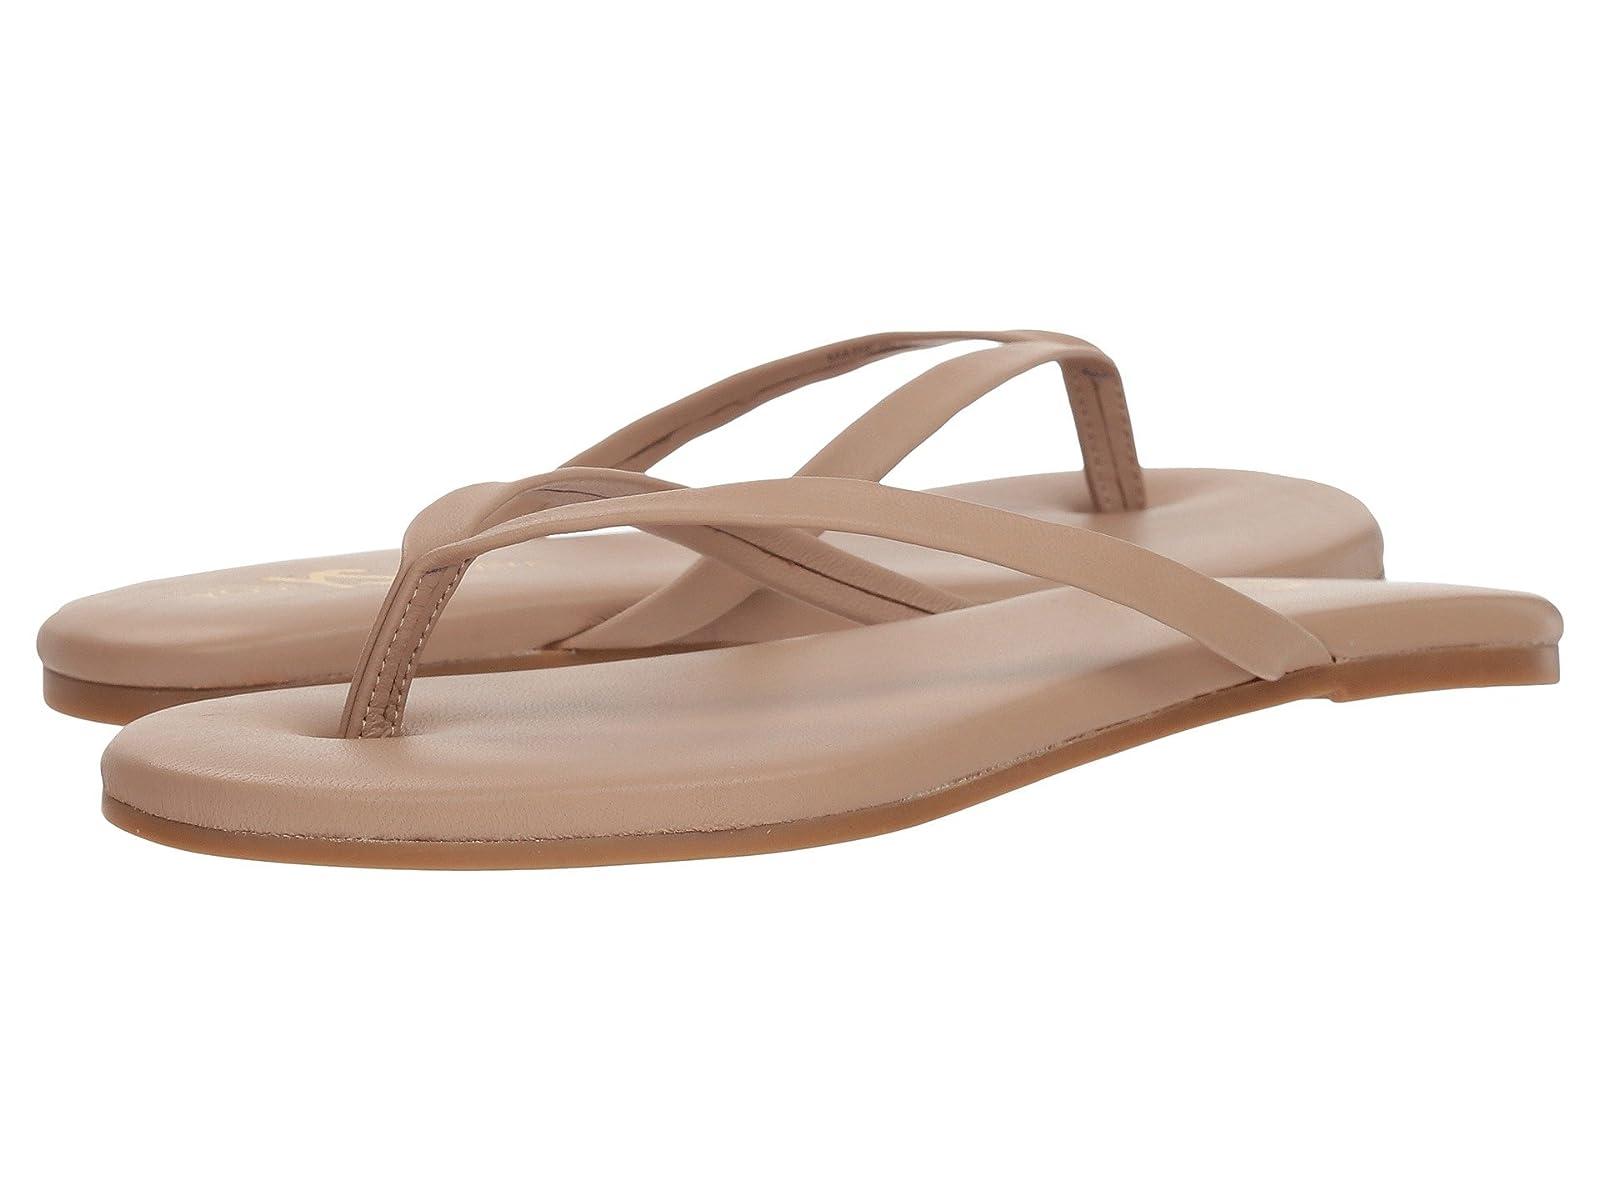 Yosi Samra RivingtonAtmospheric grades have affordable shoes